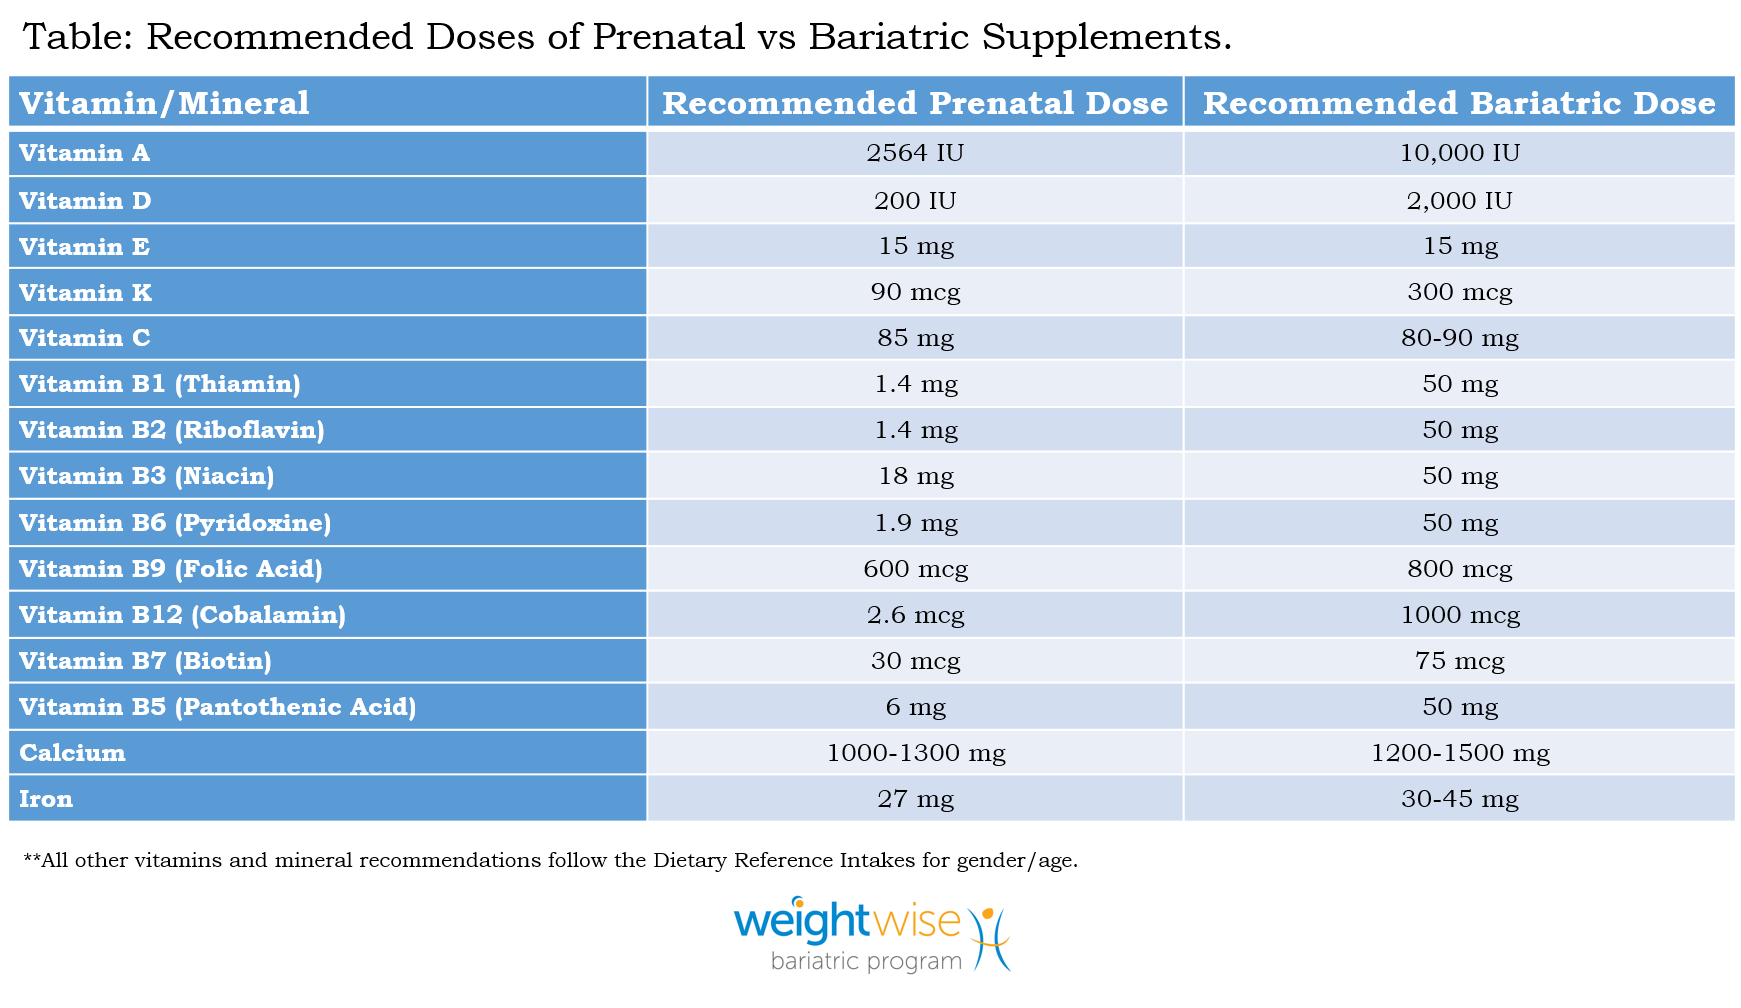 prenatal vs bariatric vitamins .jpg